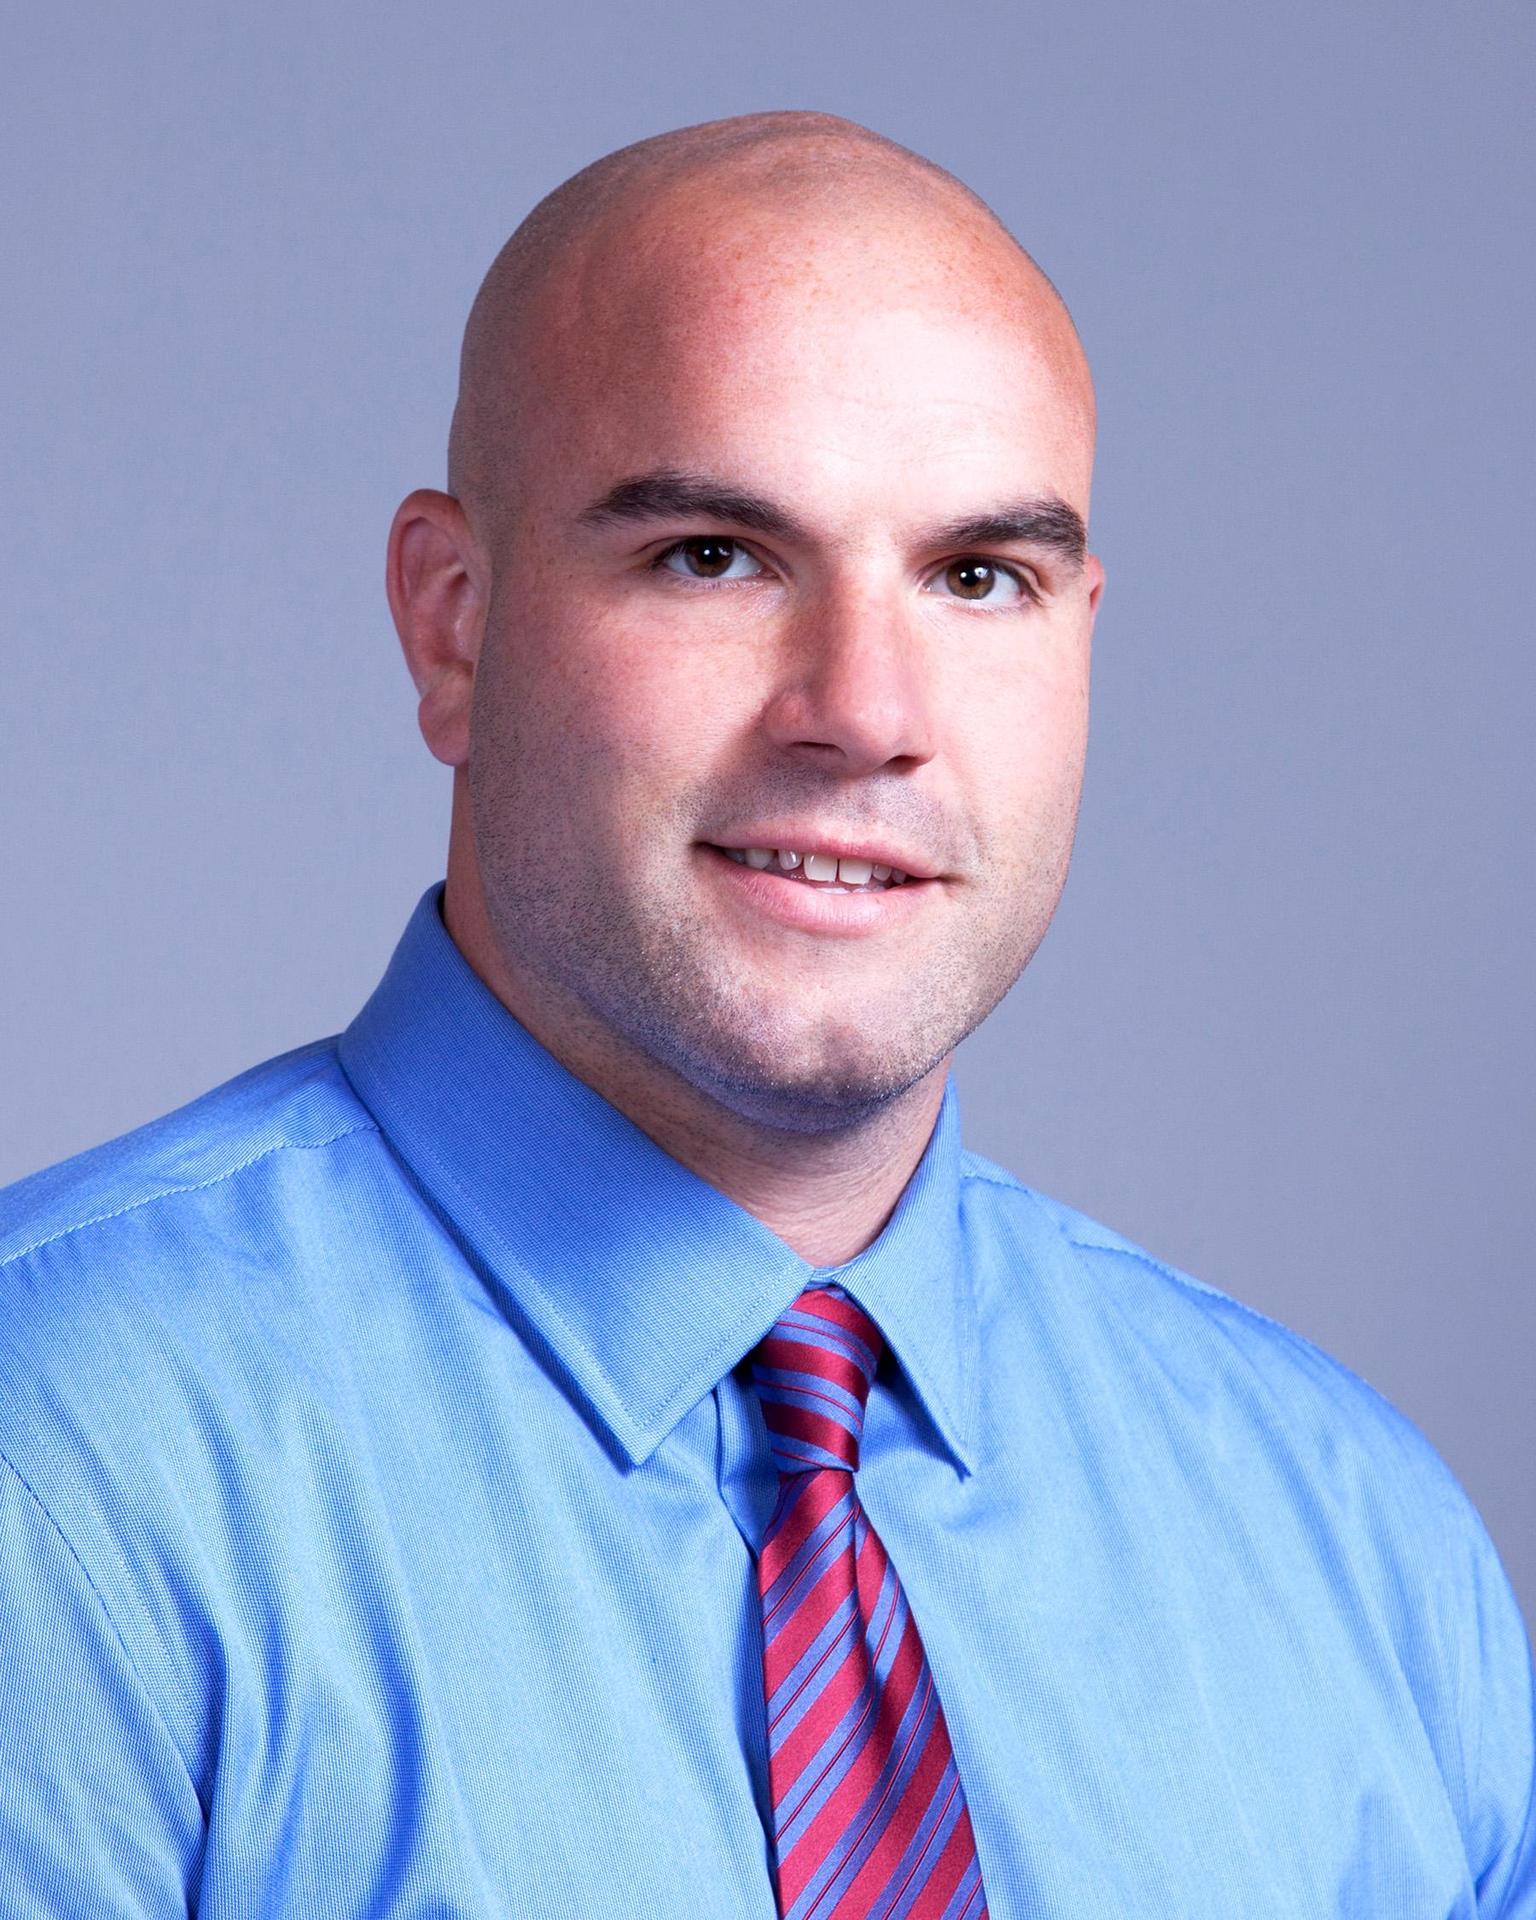 Assistant Principal Dennis Lynch